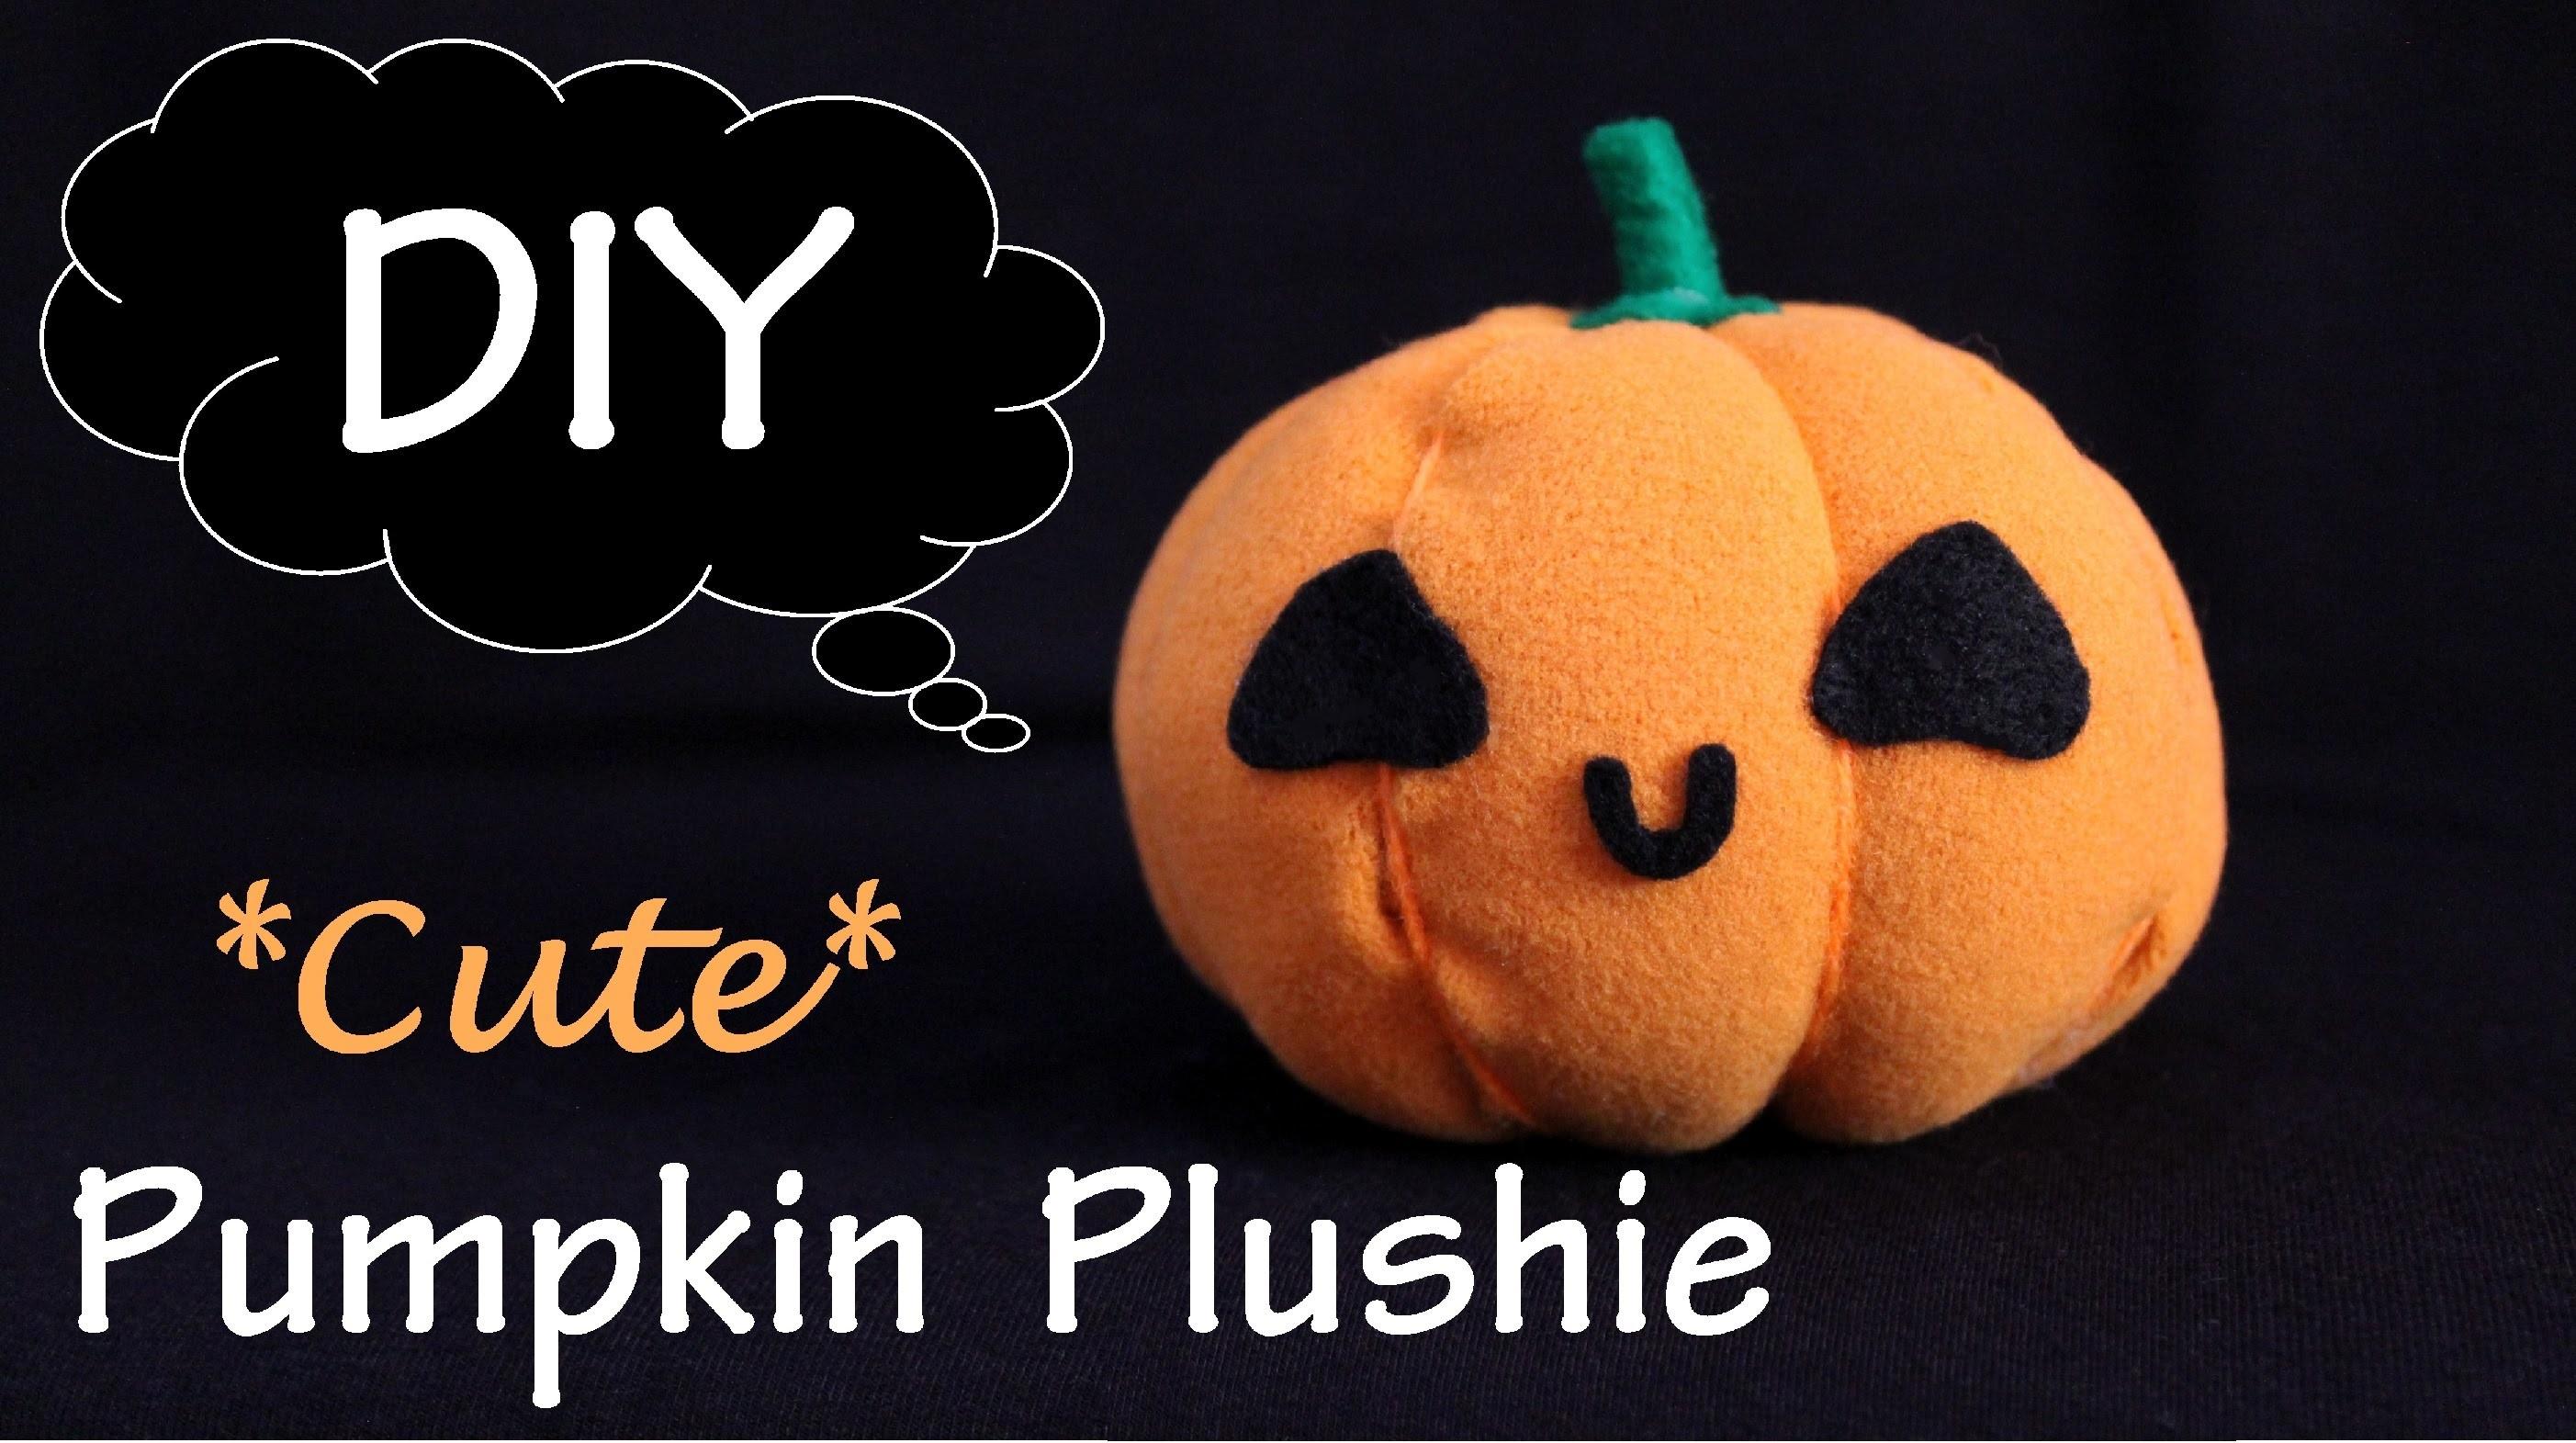 DIY Pumpkin Plushie | Halloween Part 2.2